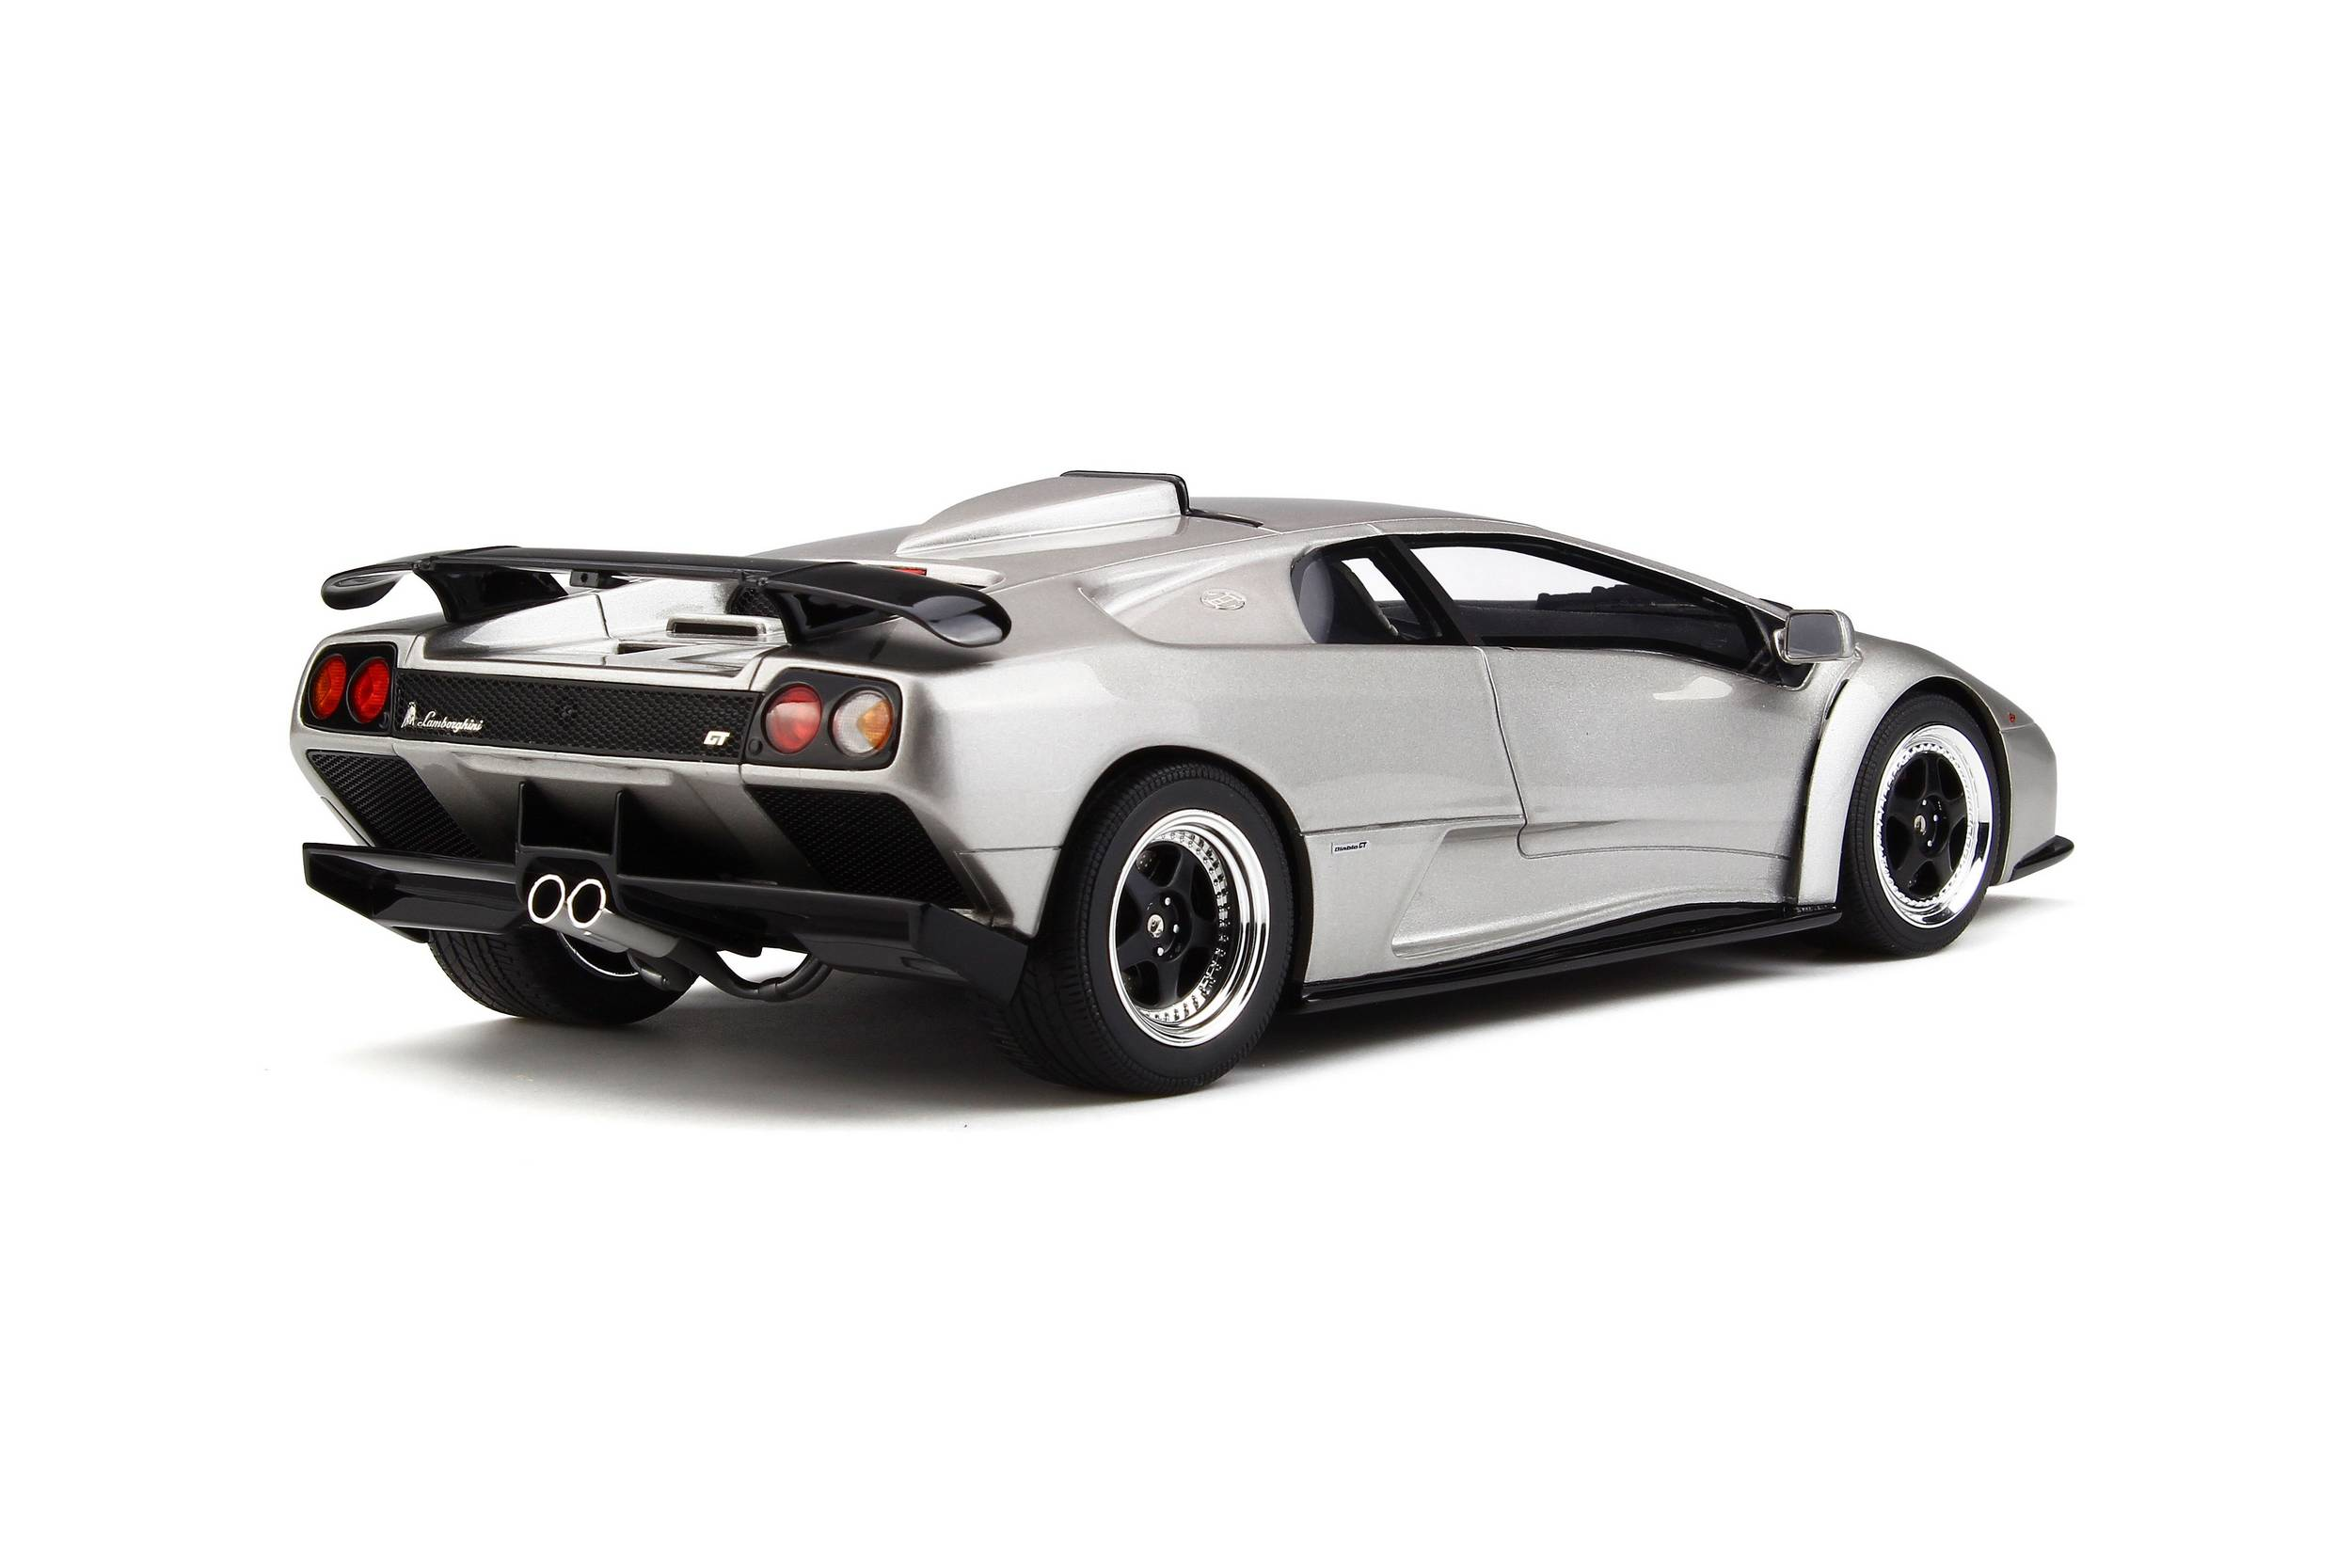 Lamborghini Diablo Gt Model Car Collection Gt Spirit